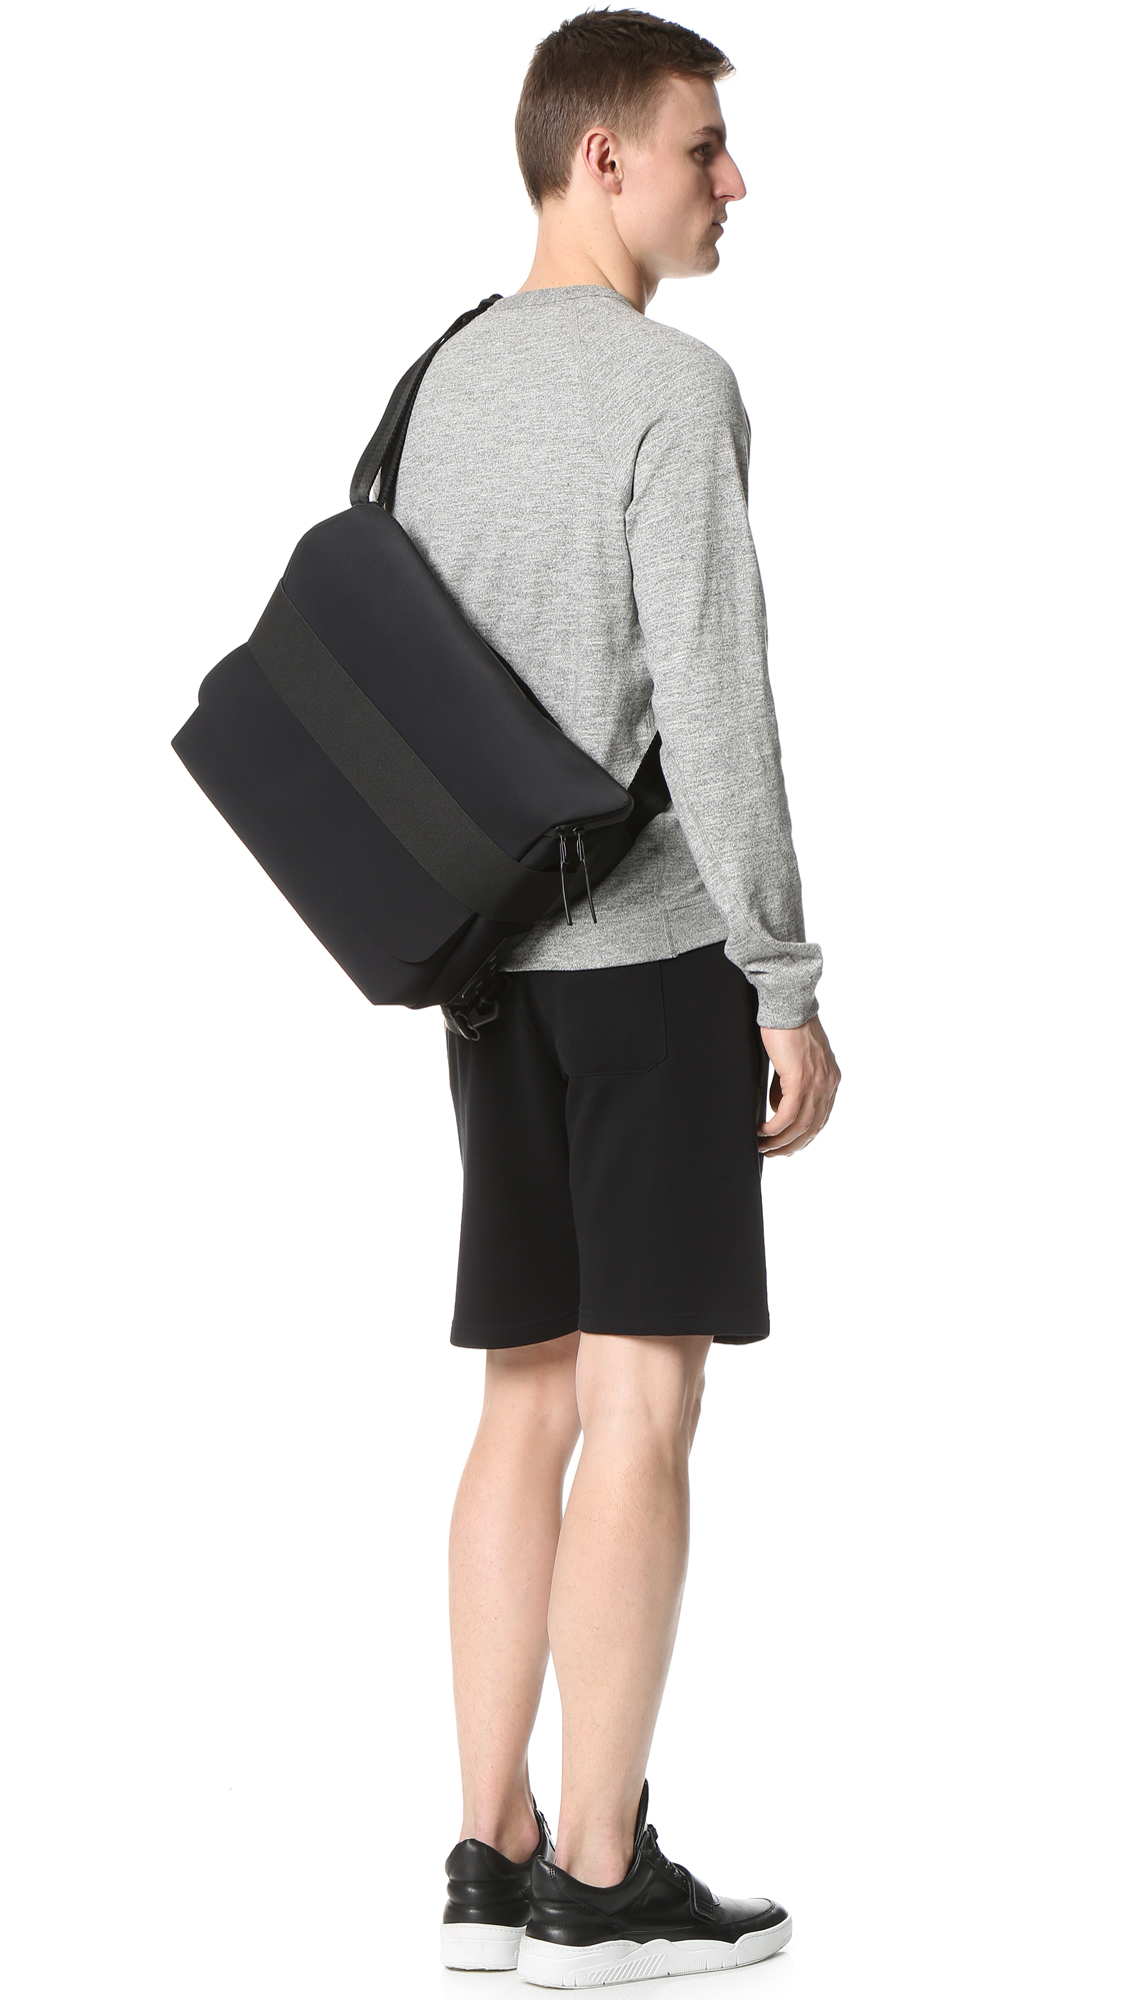 fcd2a6e50830 Lyst - Y-3 Qasa Messenger Bag in Black for Men